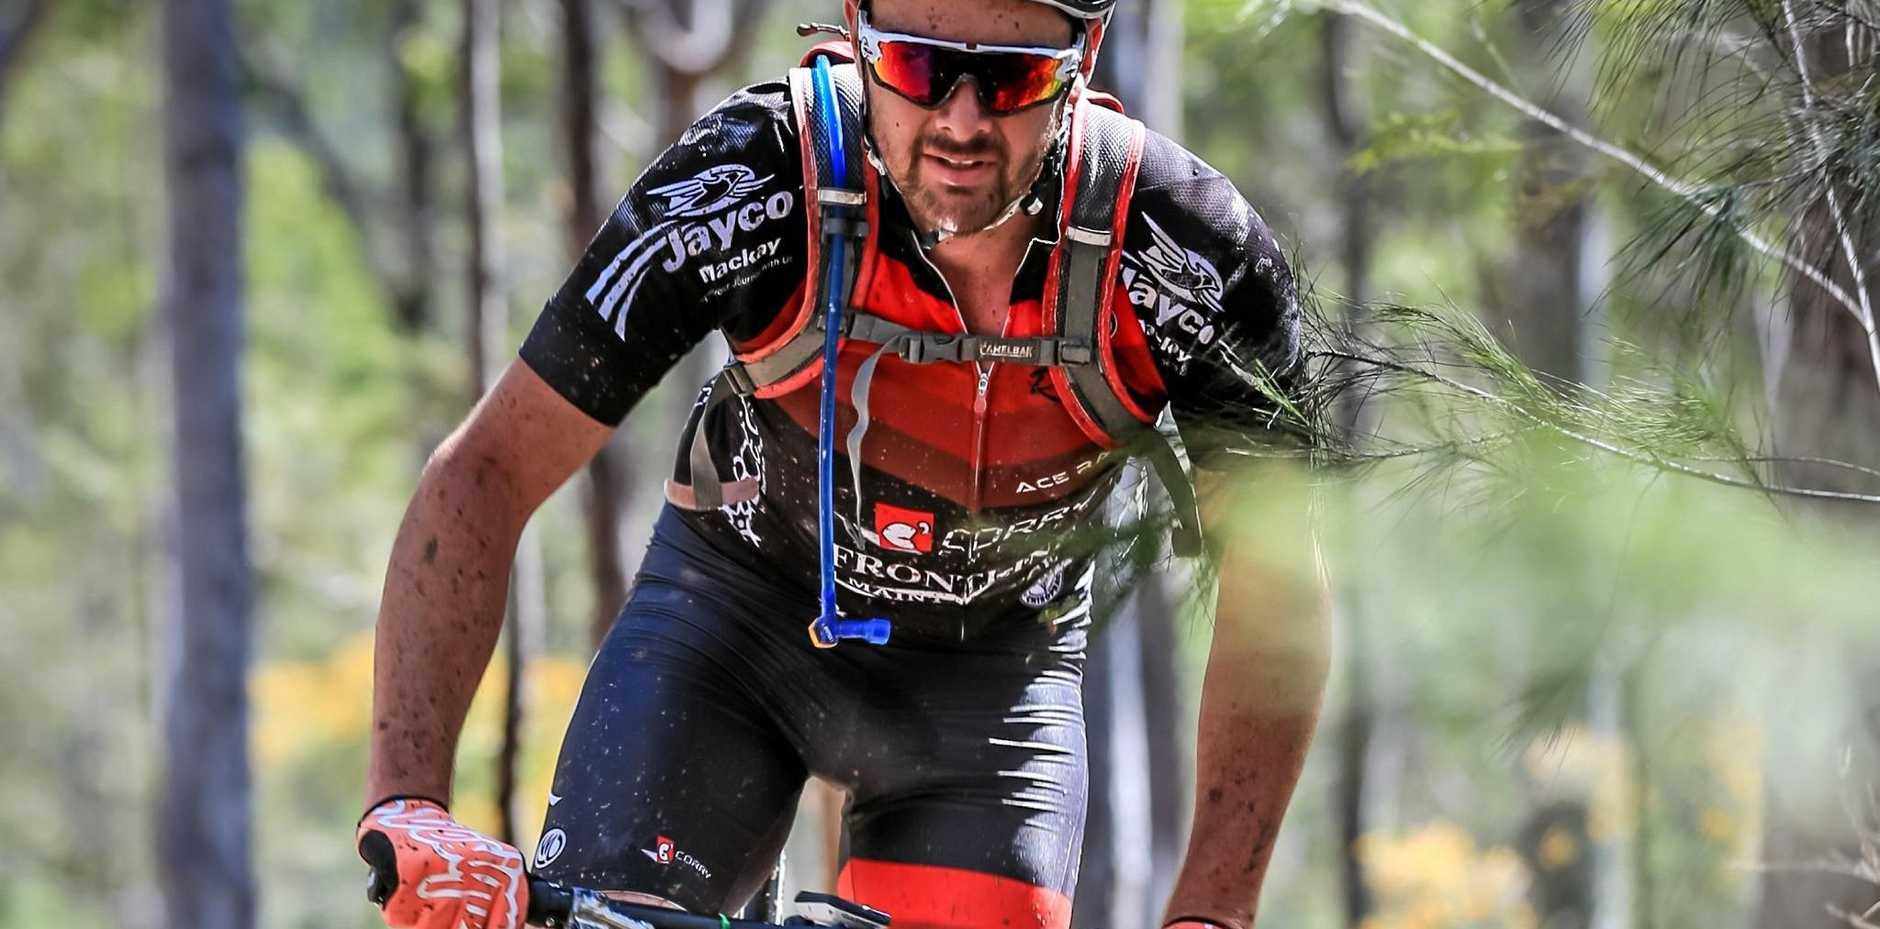 BACK UP: Mackay's Troy Garth won the national XCO marathon championship Cycle Epic round.